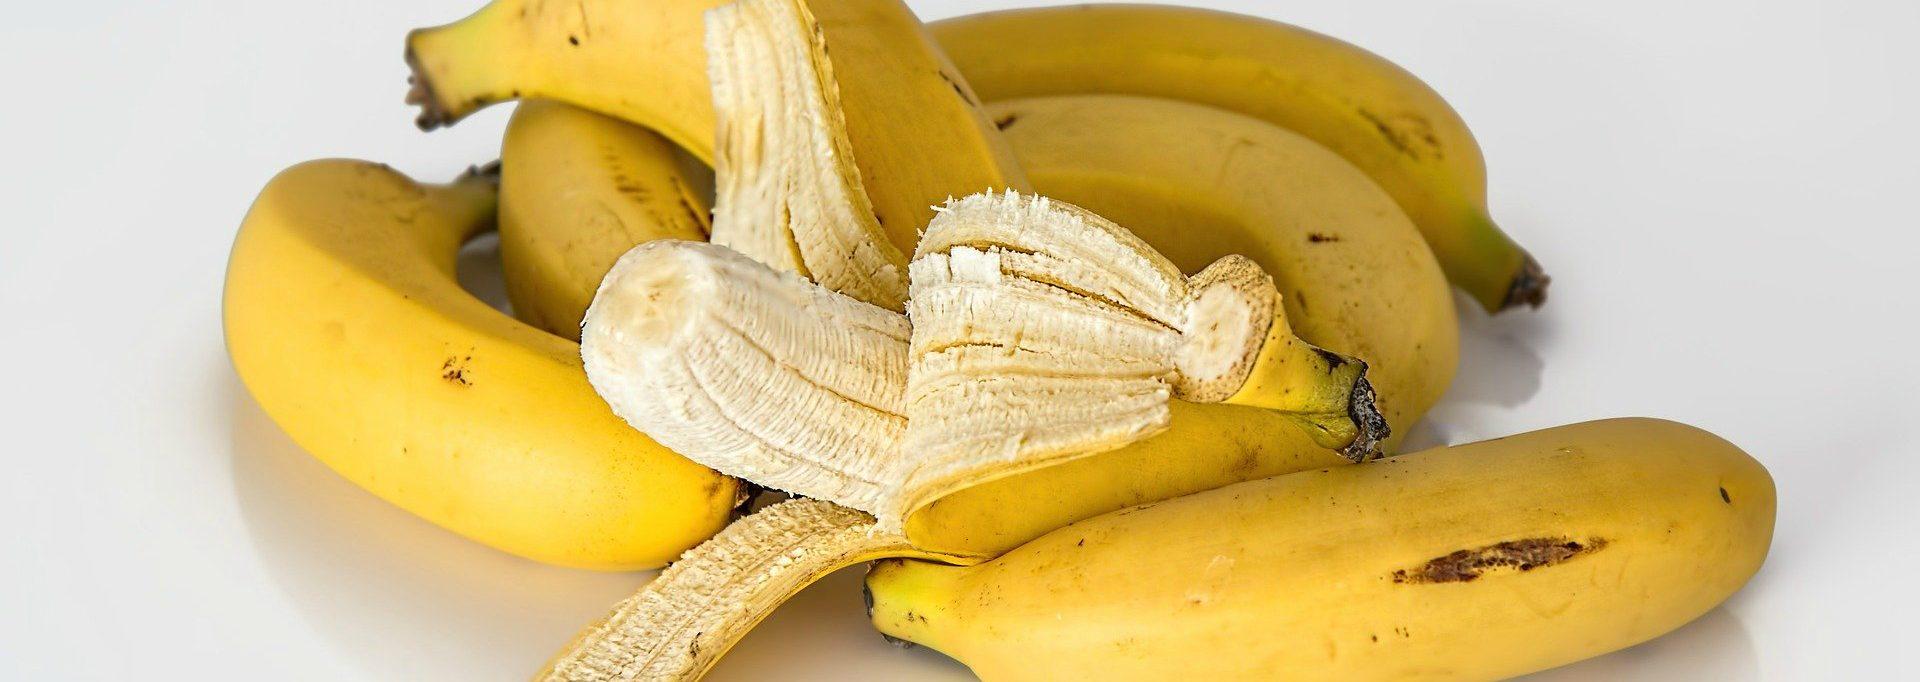 Avocado Banana Carrot Smoothie